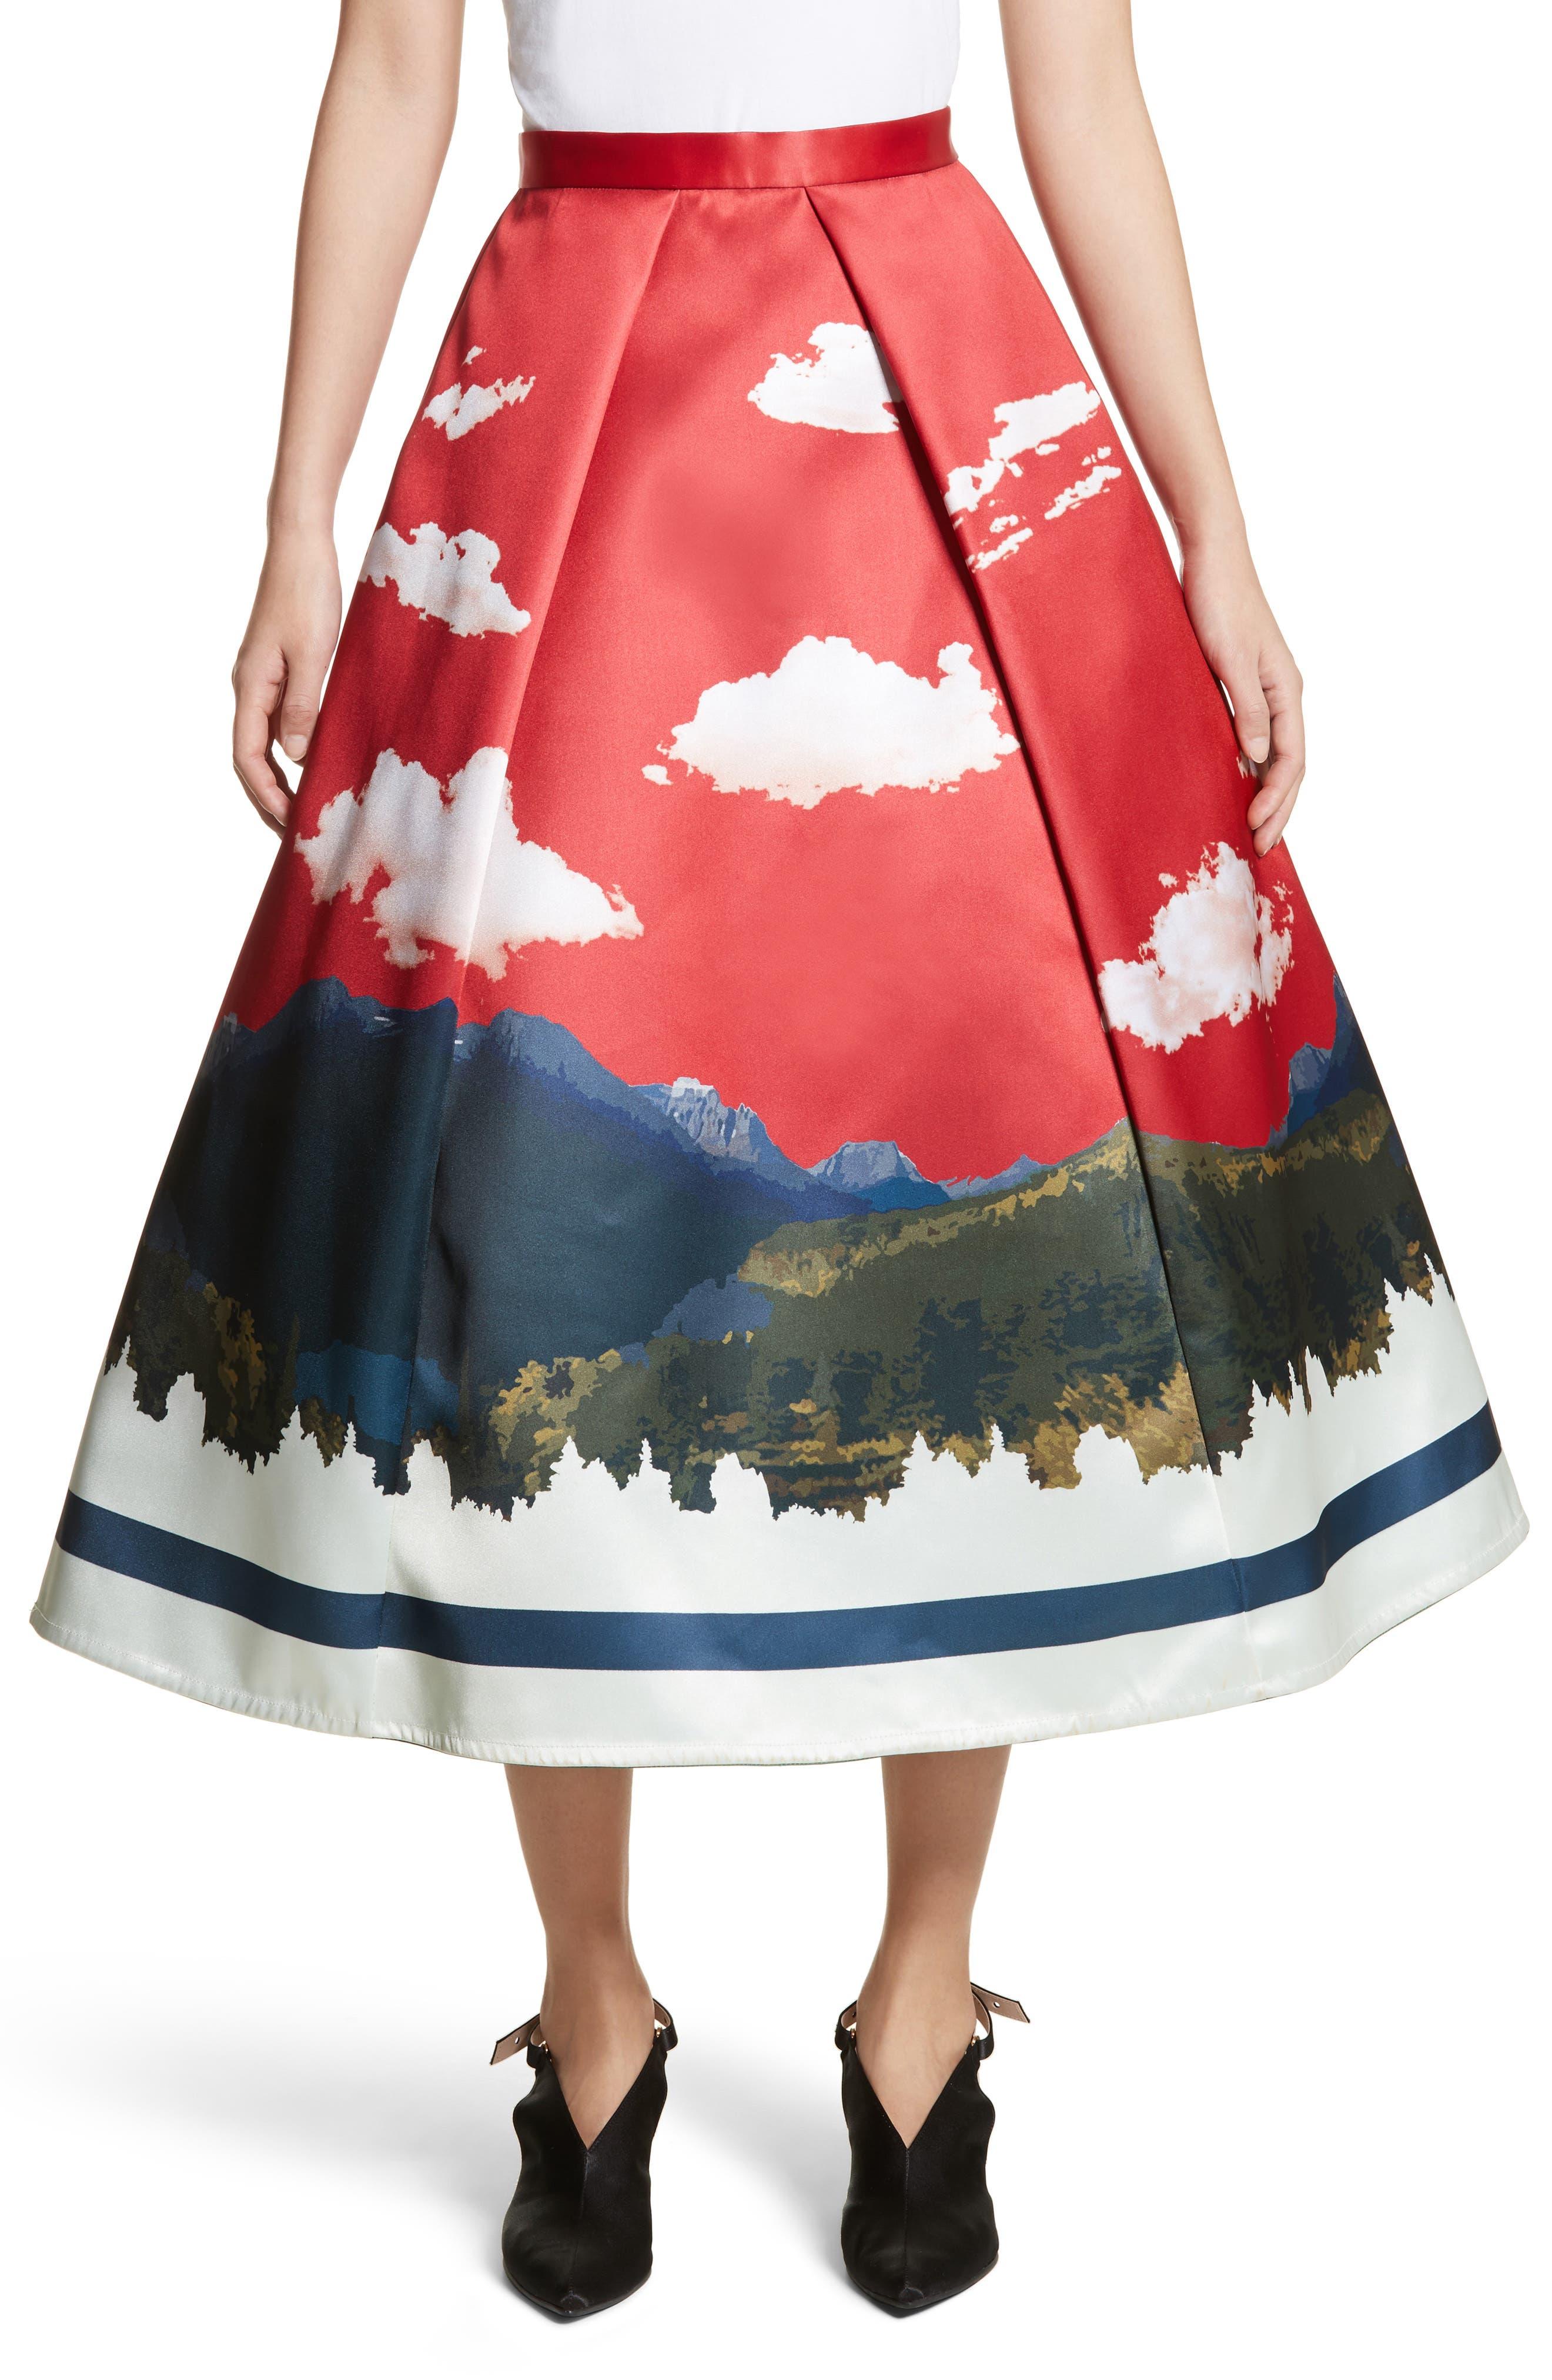 Undercover Day/Night Reversible Skirt